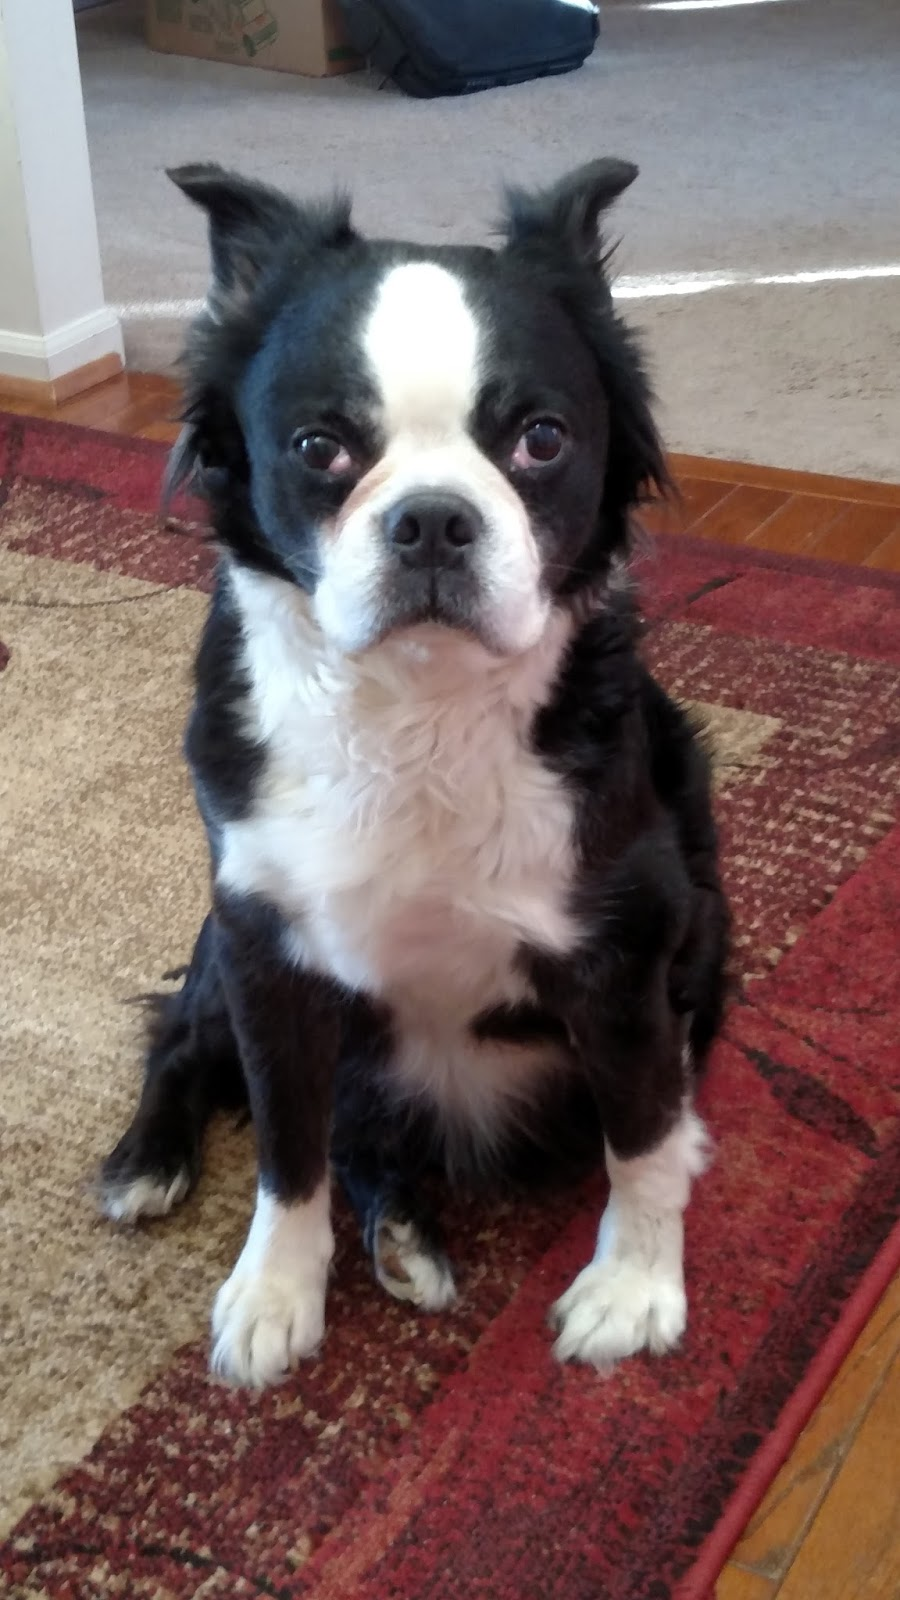 Boston terrier adoption nj - Dentacoin subreddit movies